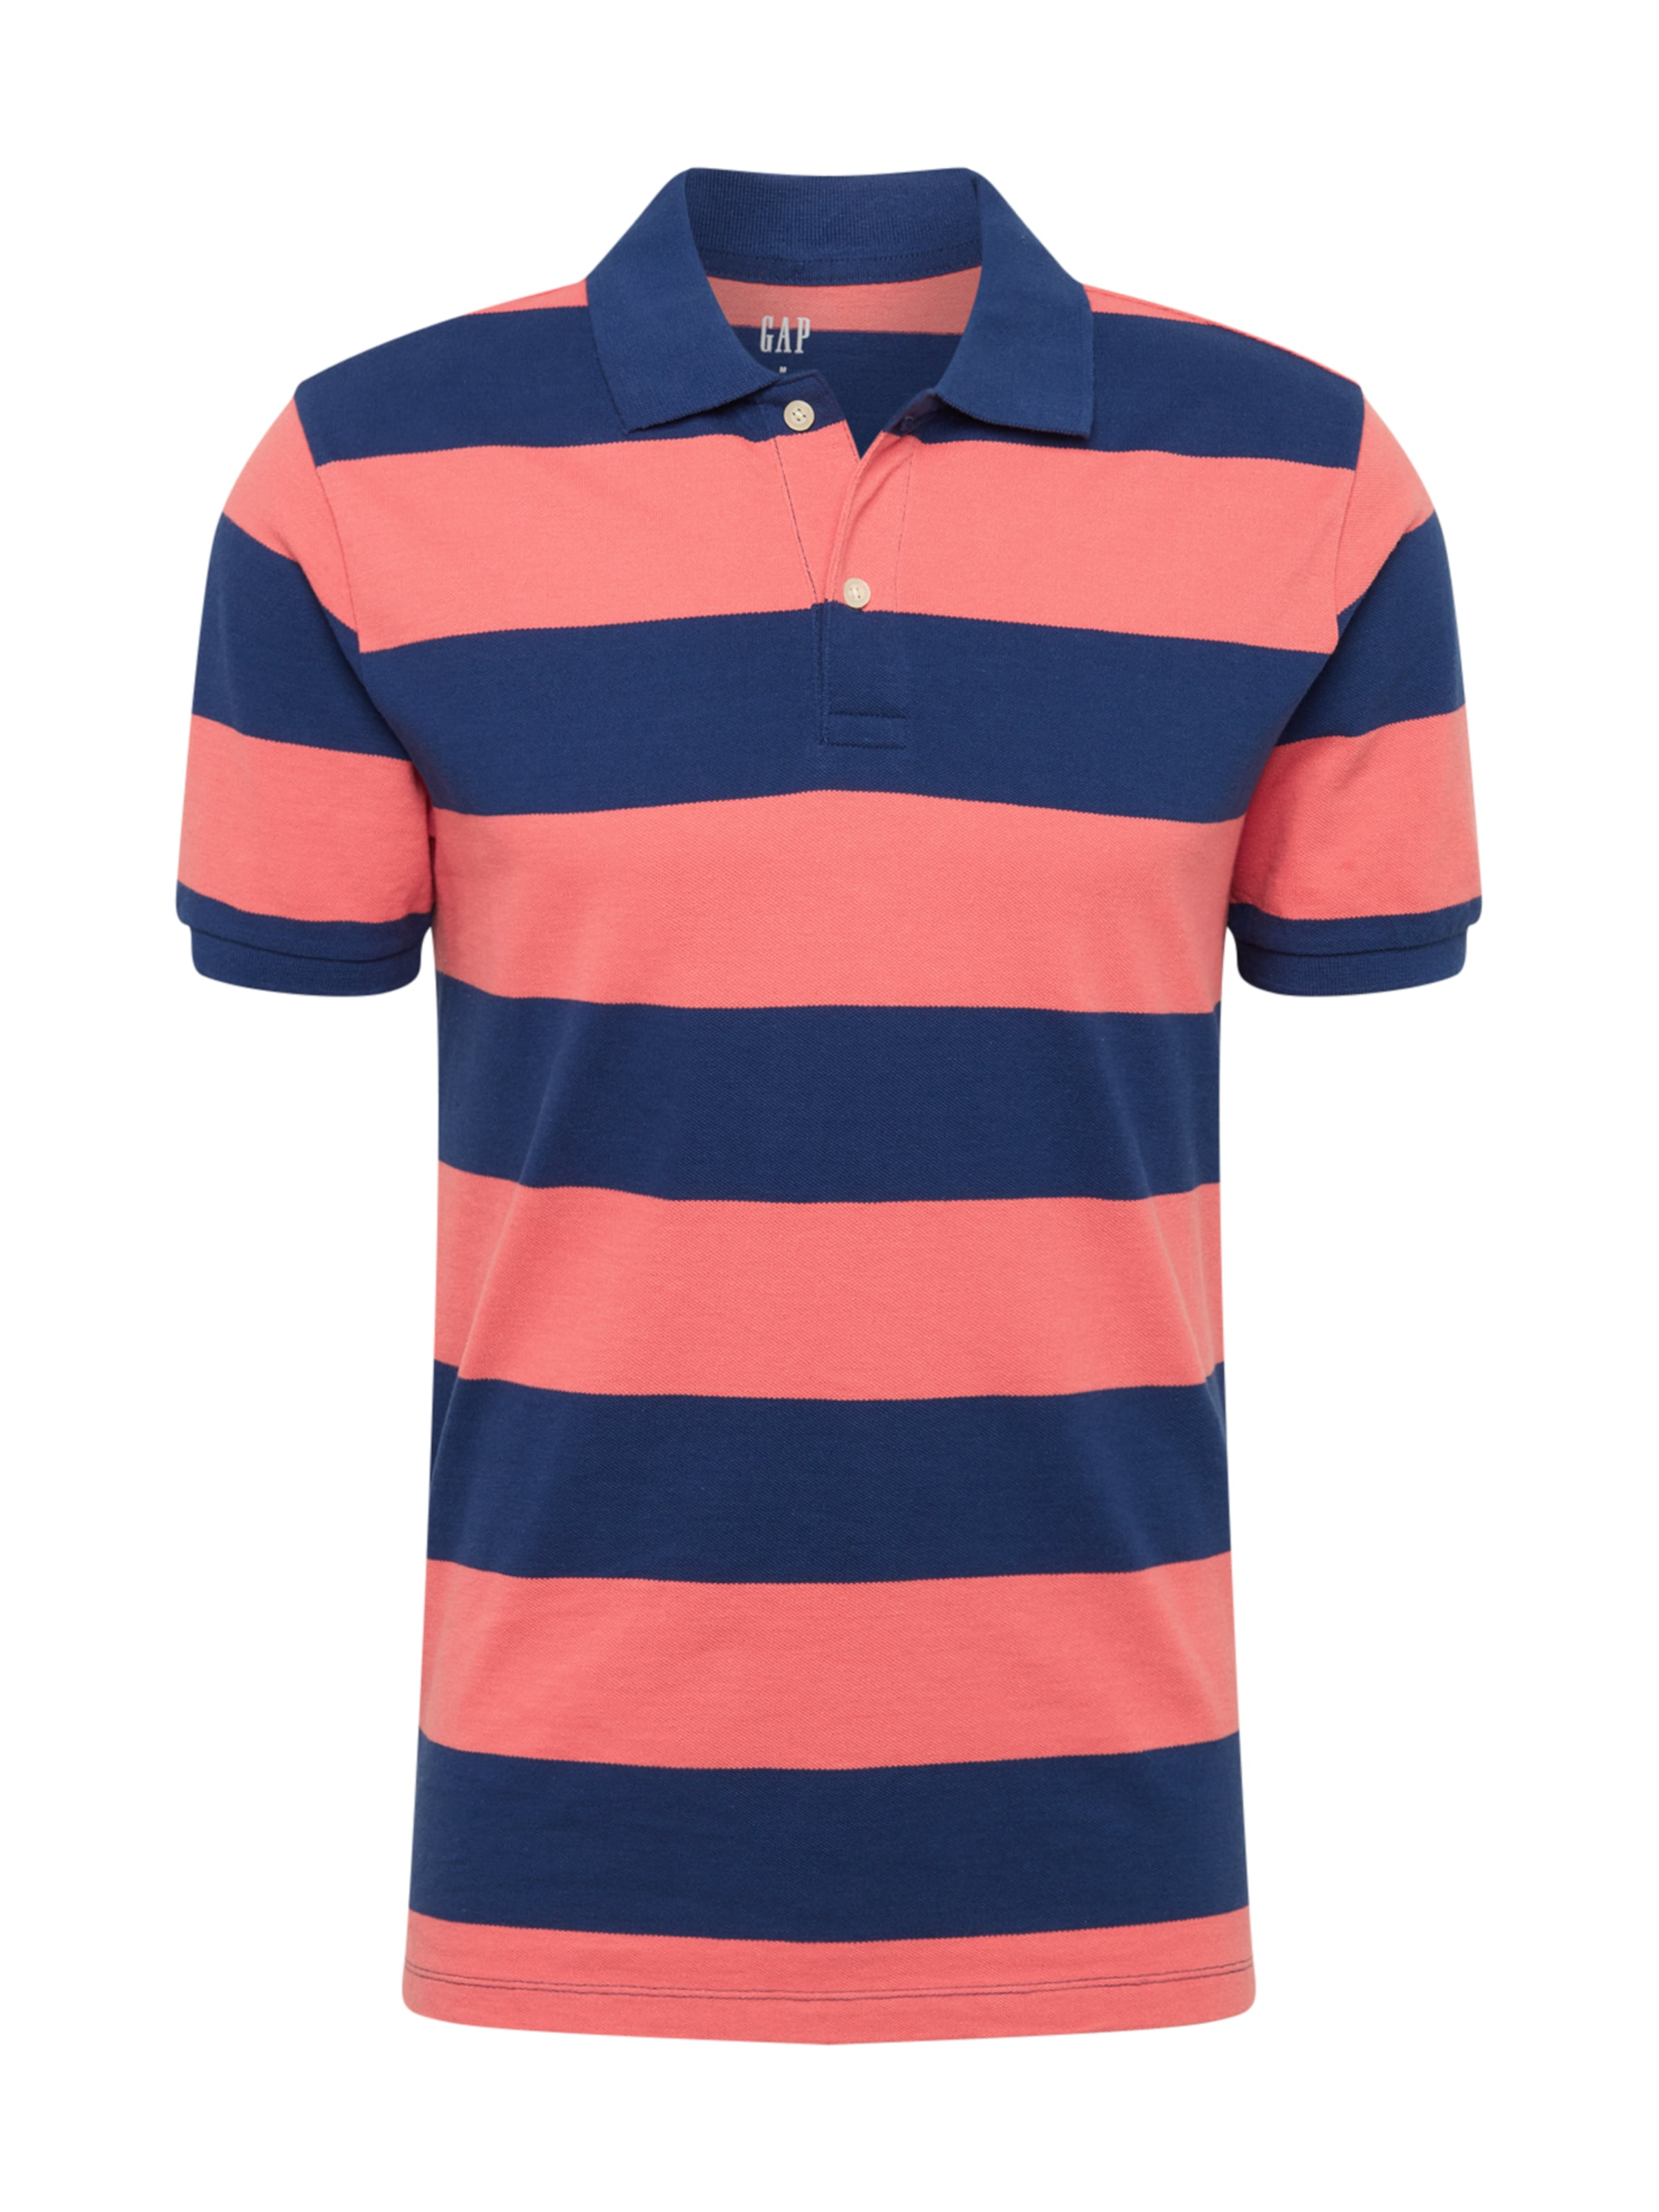 Gap Bleu MarineRose T shirt En TK1ulJc3F